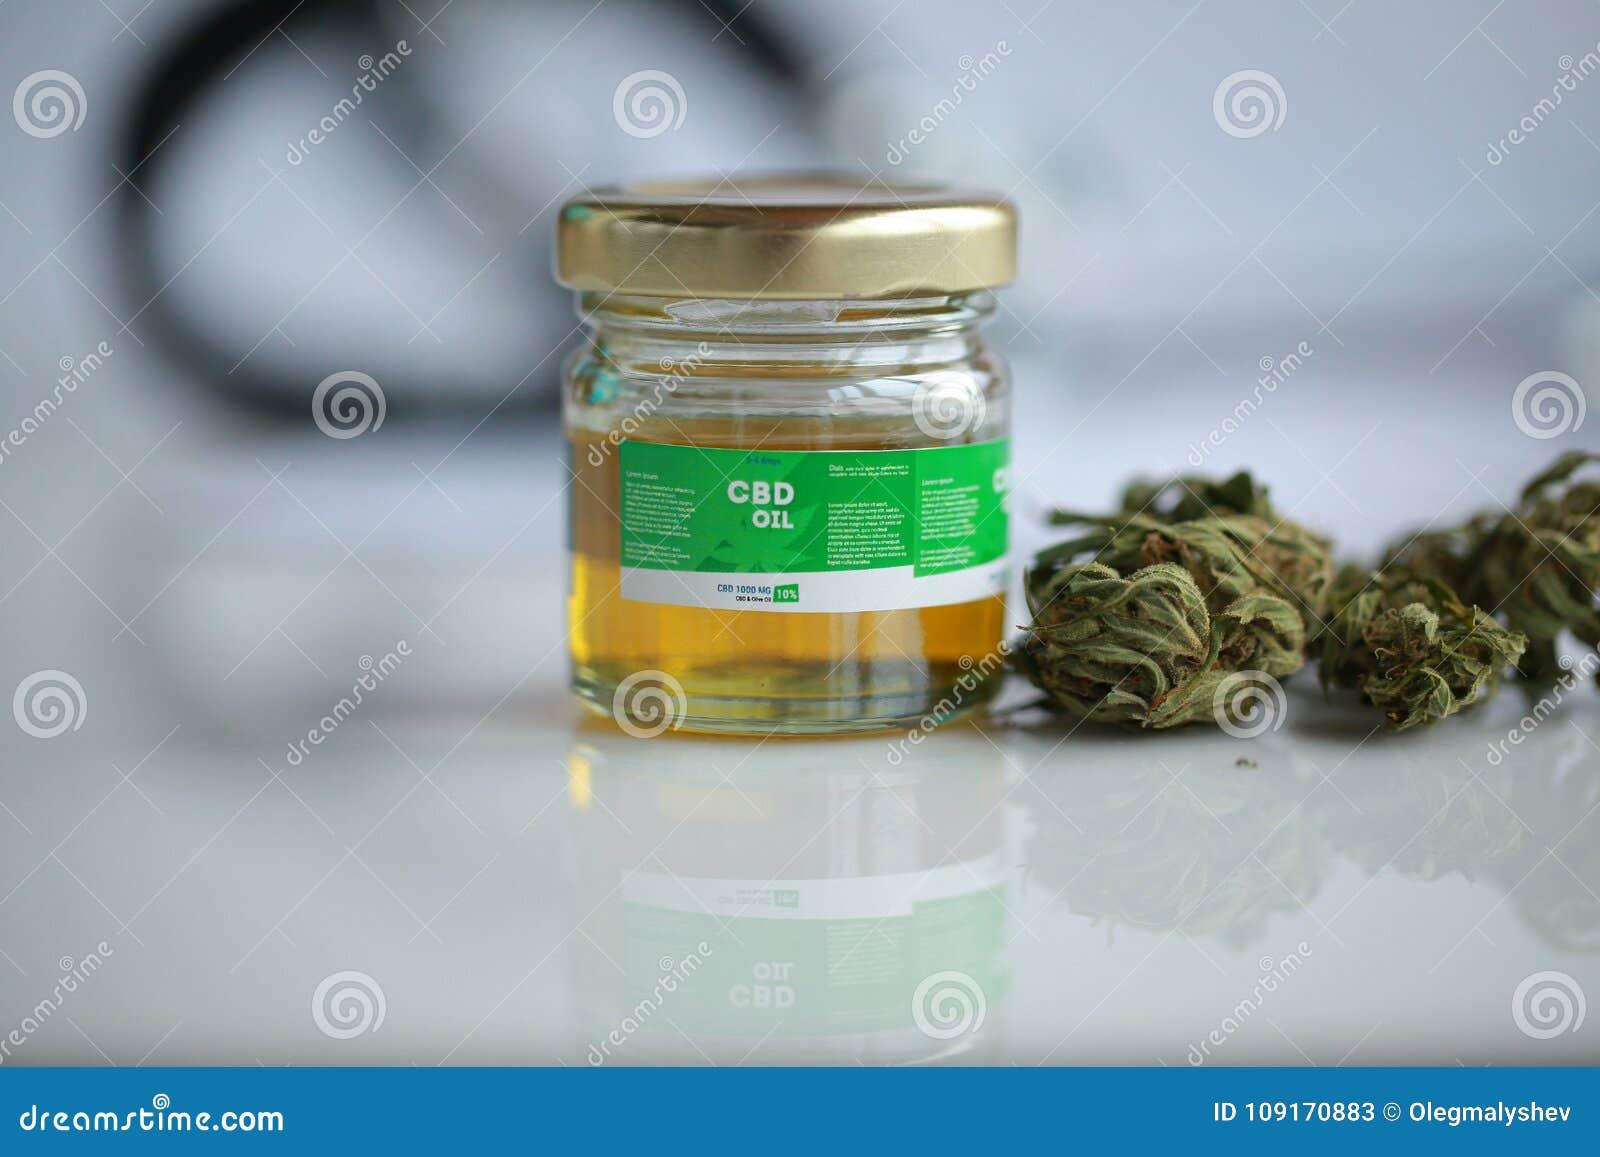 Dry Cannabis, CBD Oil ,stethoscope And Recipe Stock Image